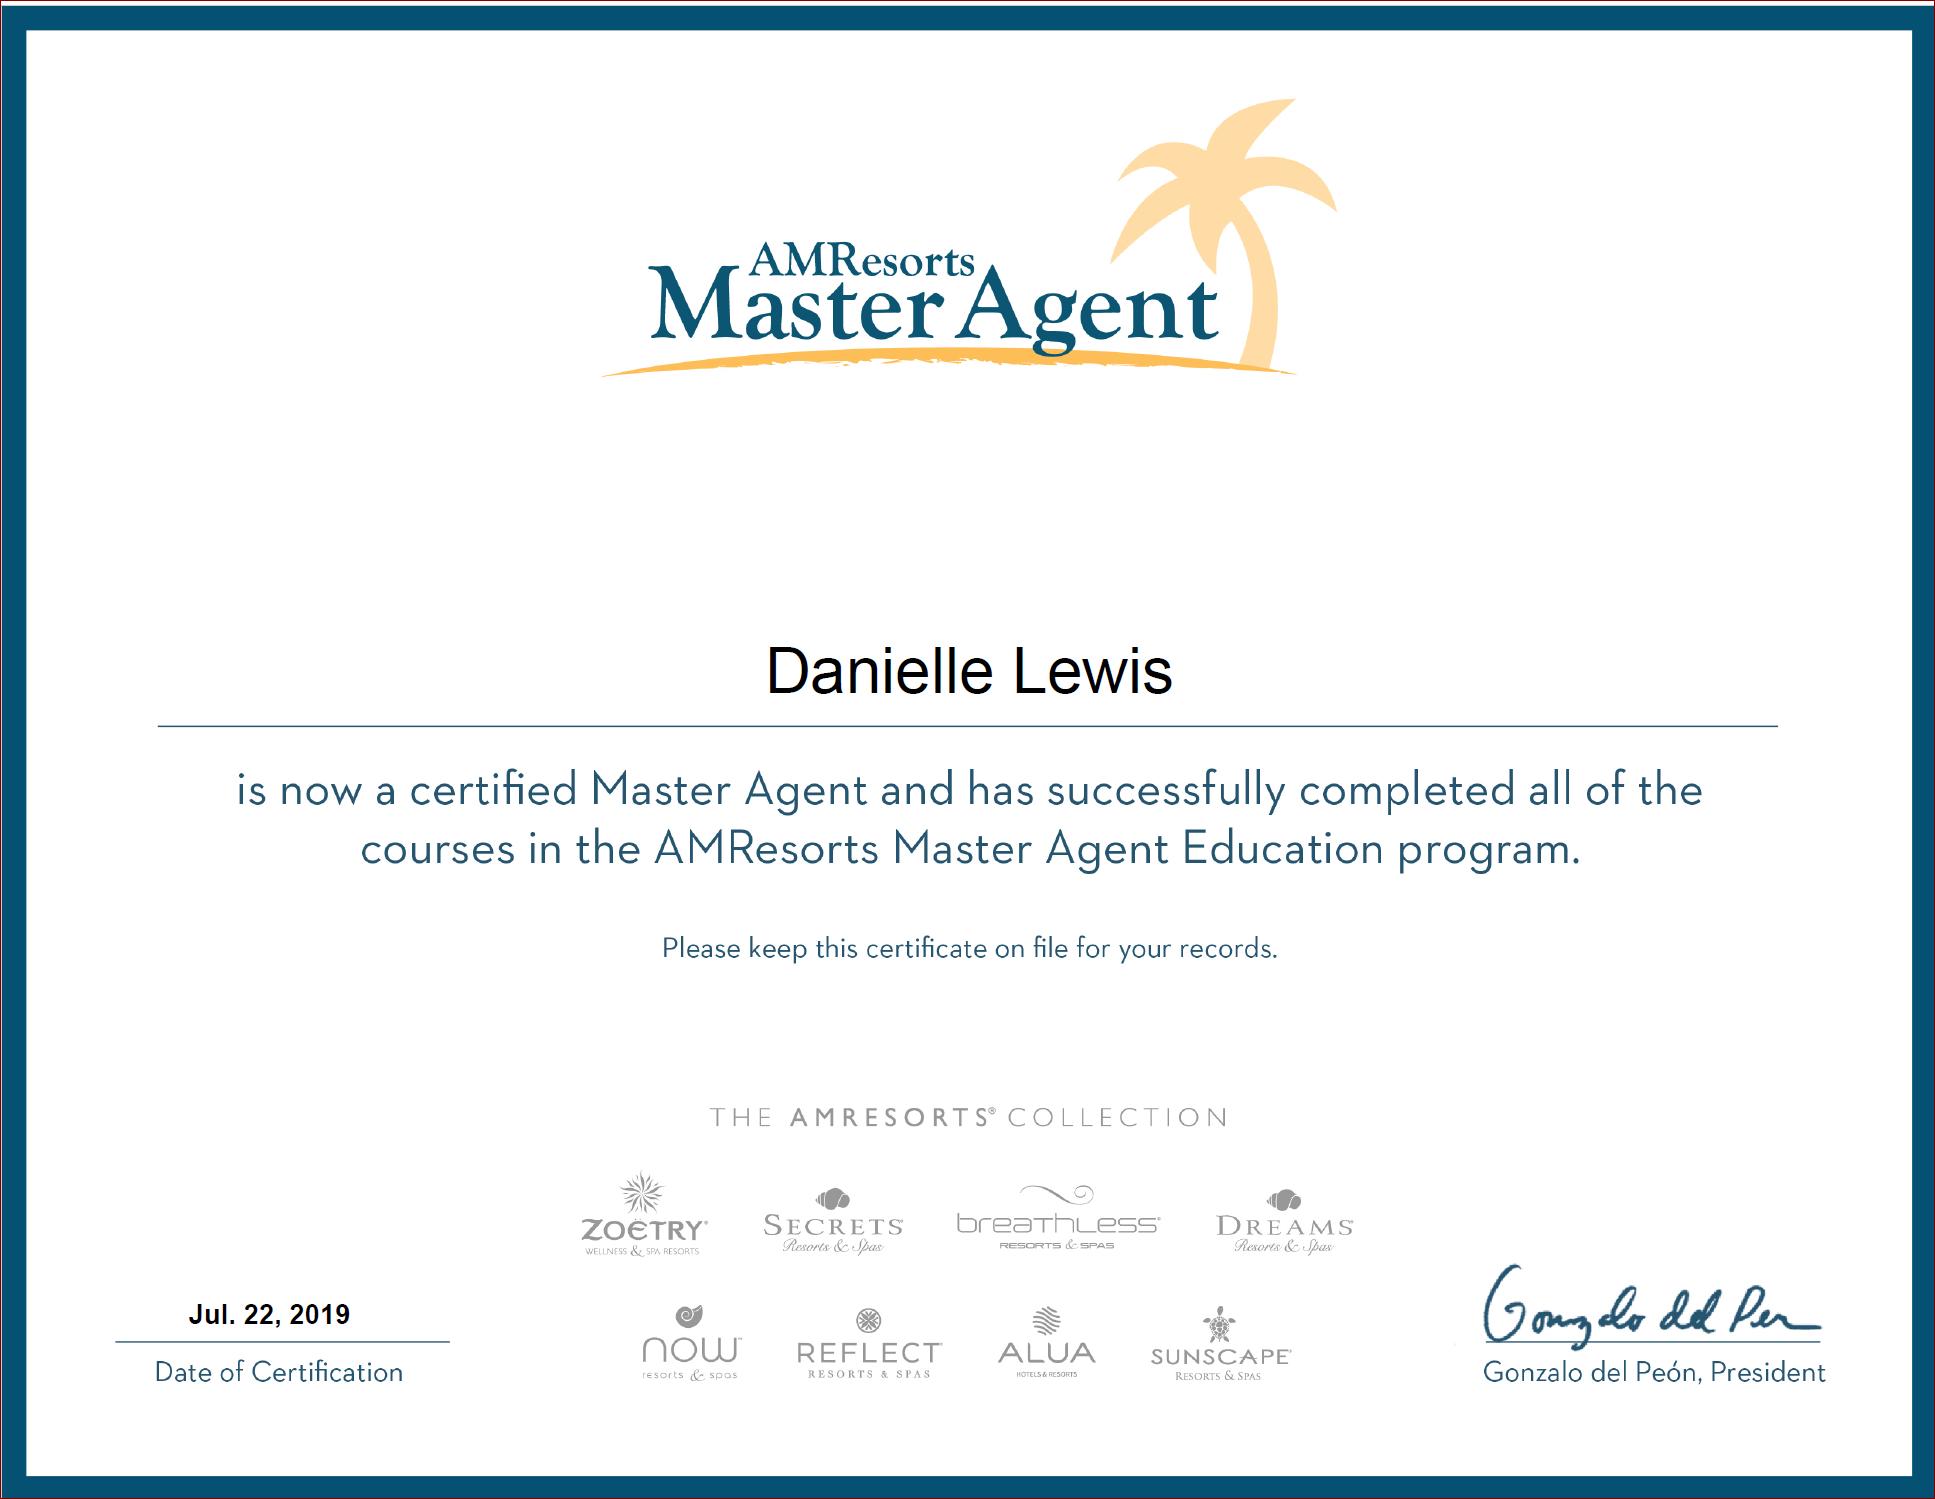 SelfishMe Travel - AMResorts Master Agent Certificate